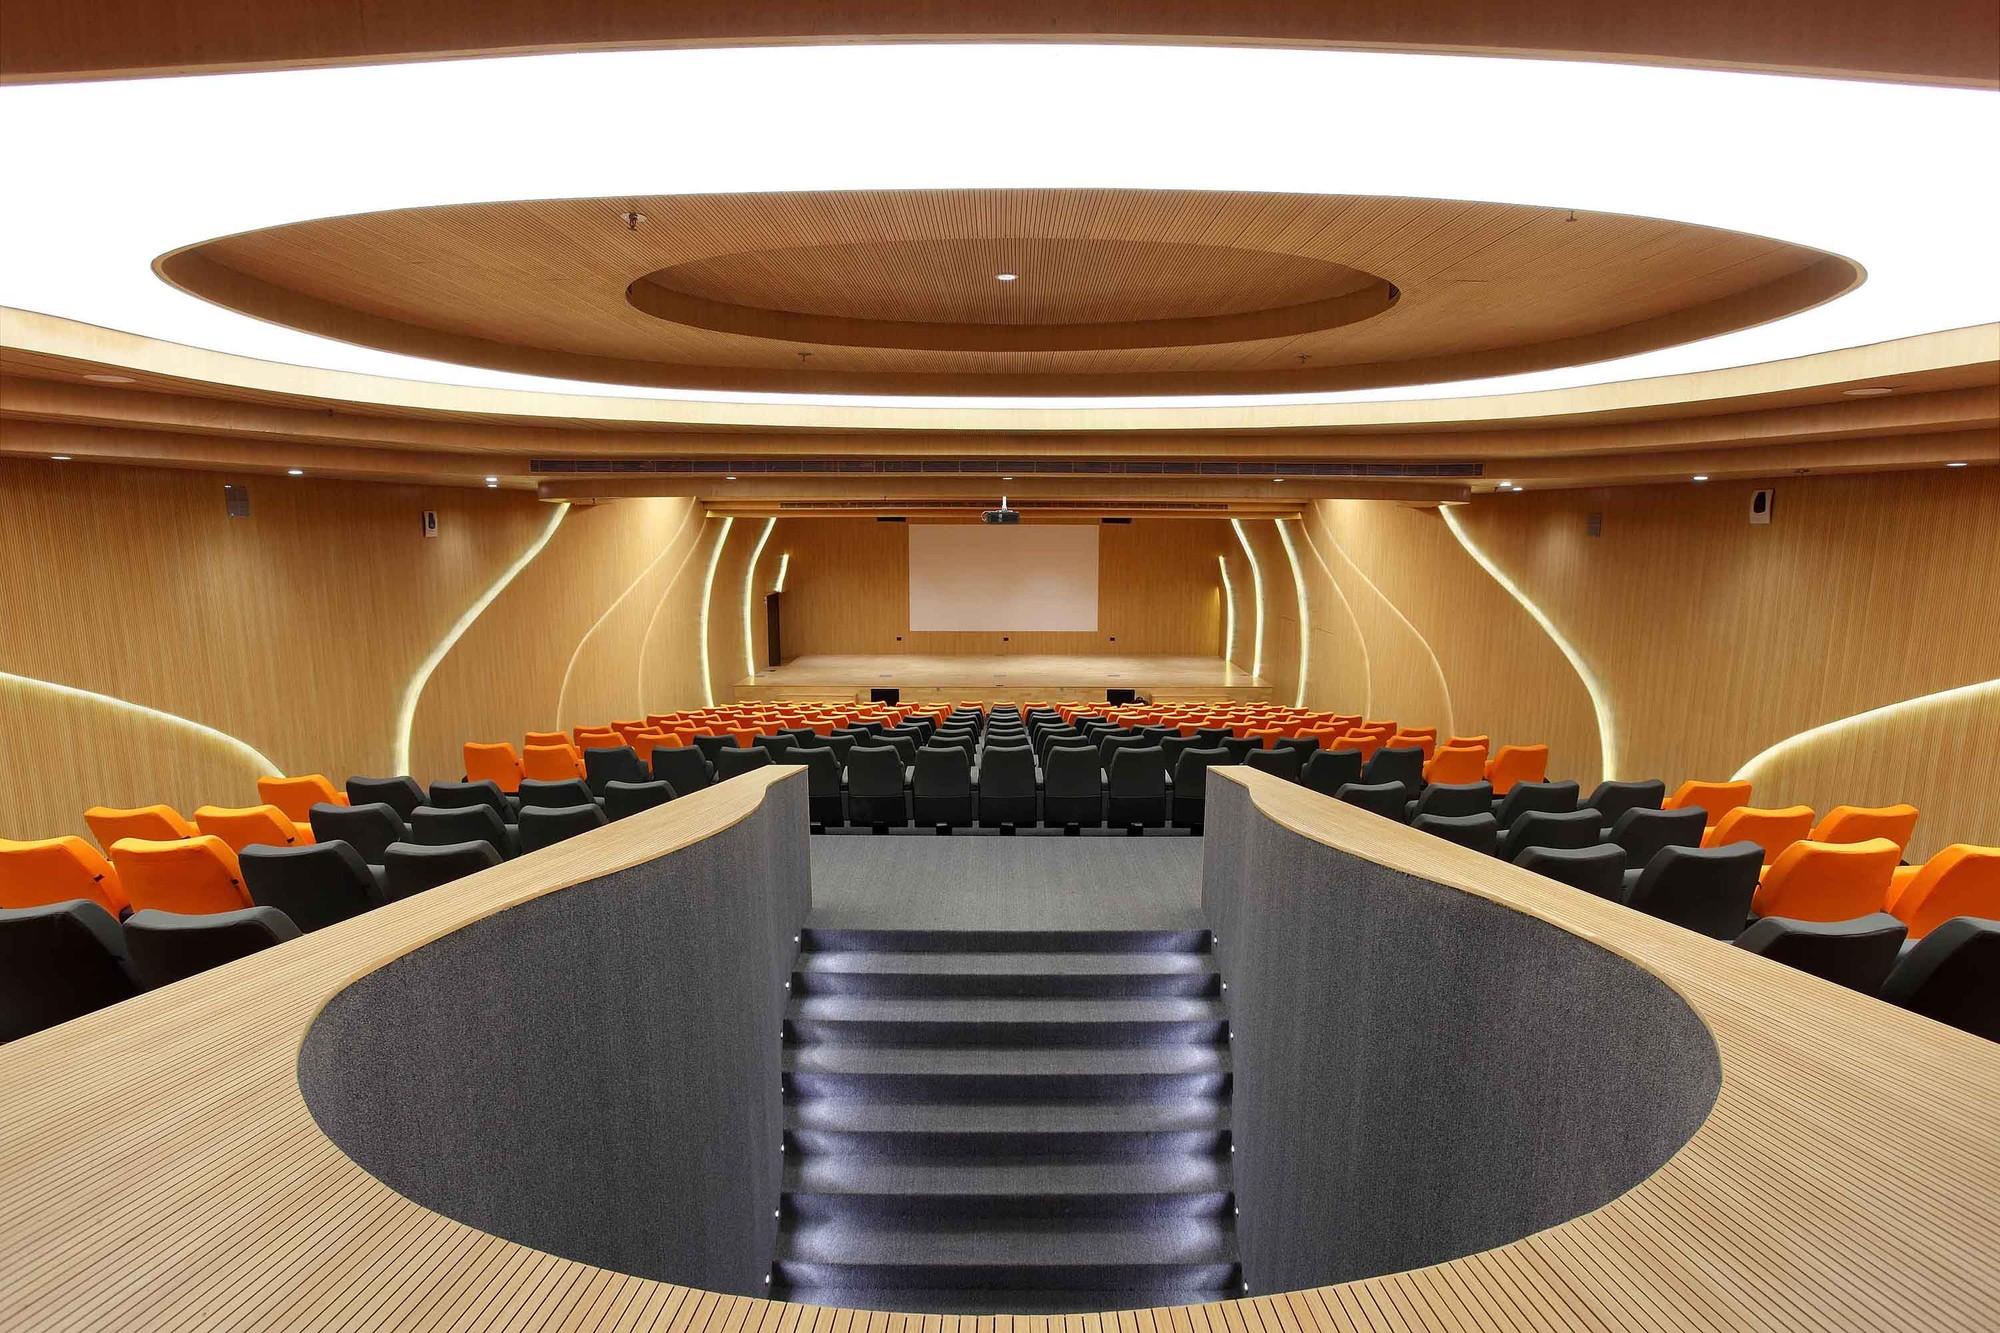 Gallery of m auditorium planet 3 studios architecture 6 for Control m architecture